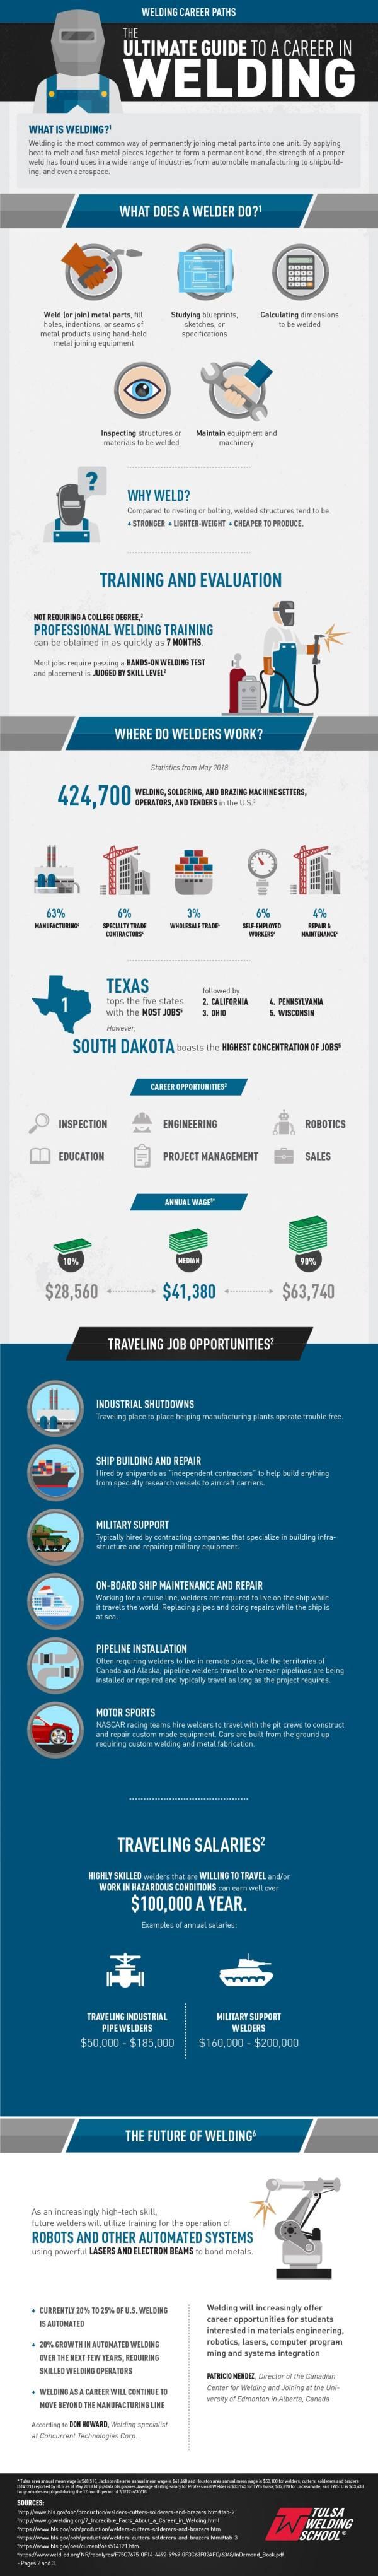 Welding Career Paths Ultimate Guide In